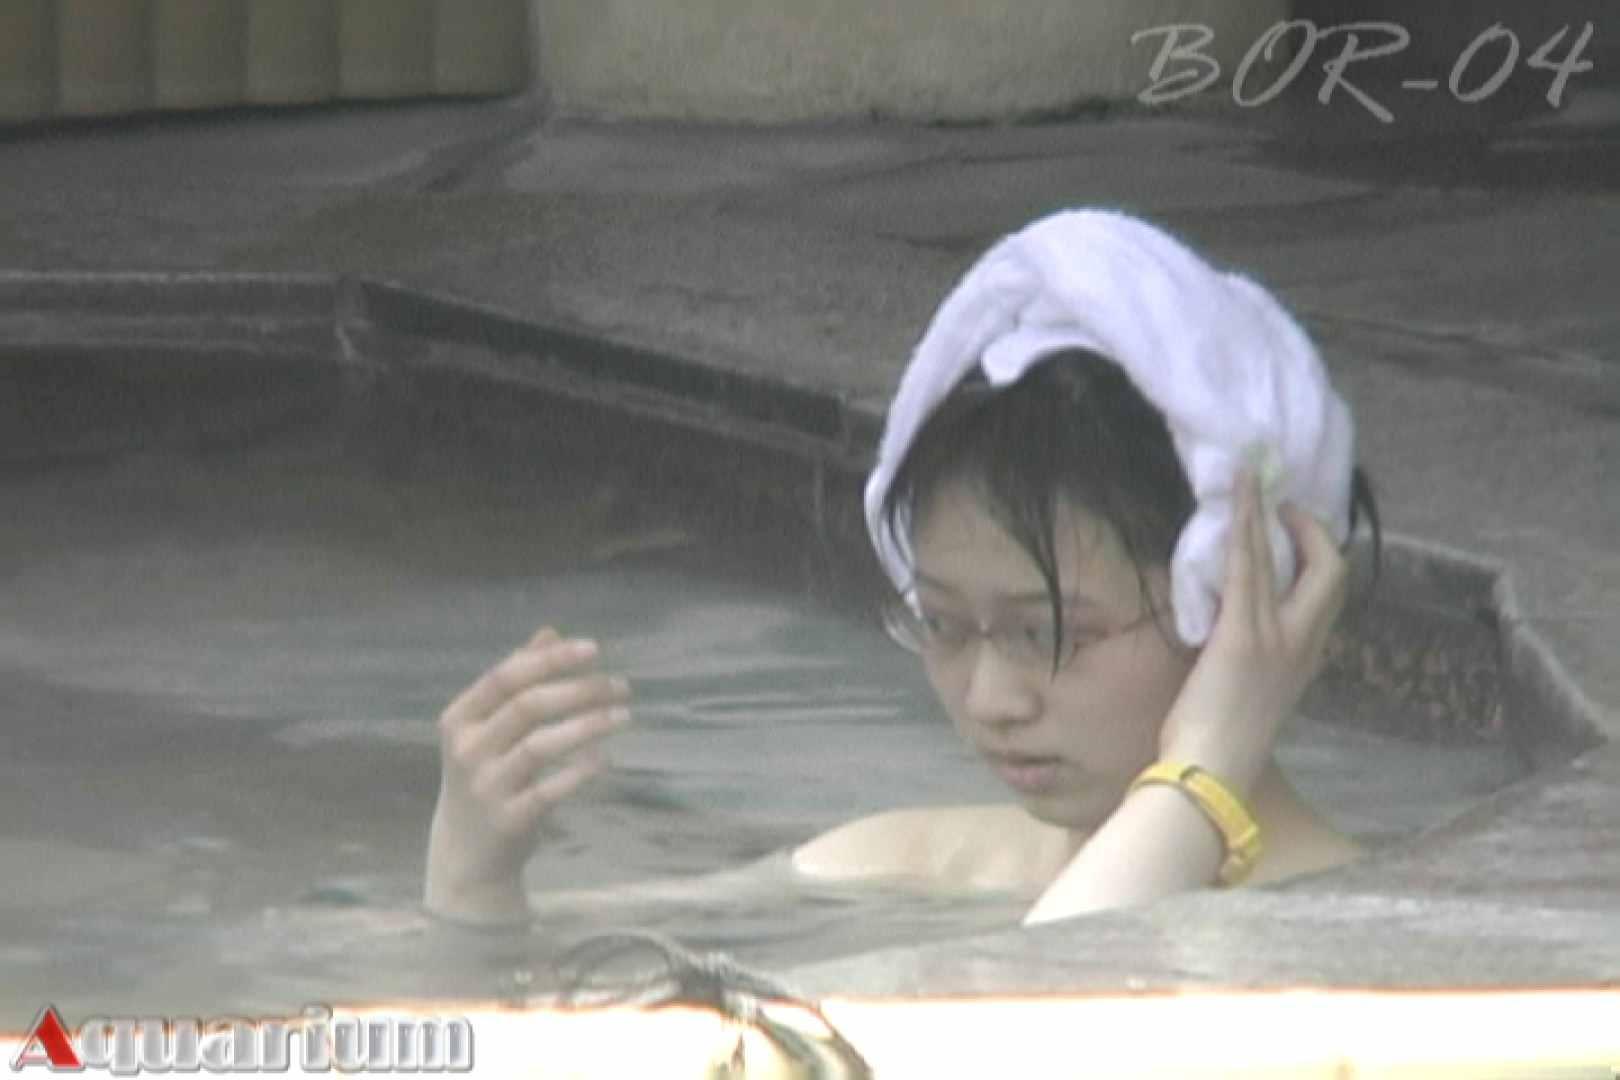 Aquaな露天風呂Vol.507 露天 ワレメ無修正動画無料 84画像 32